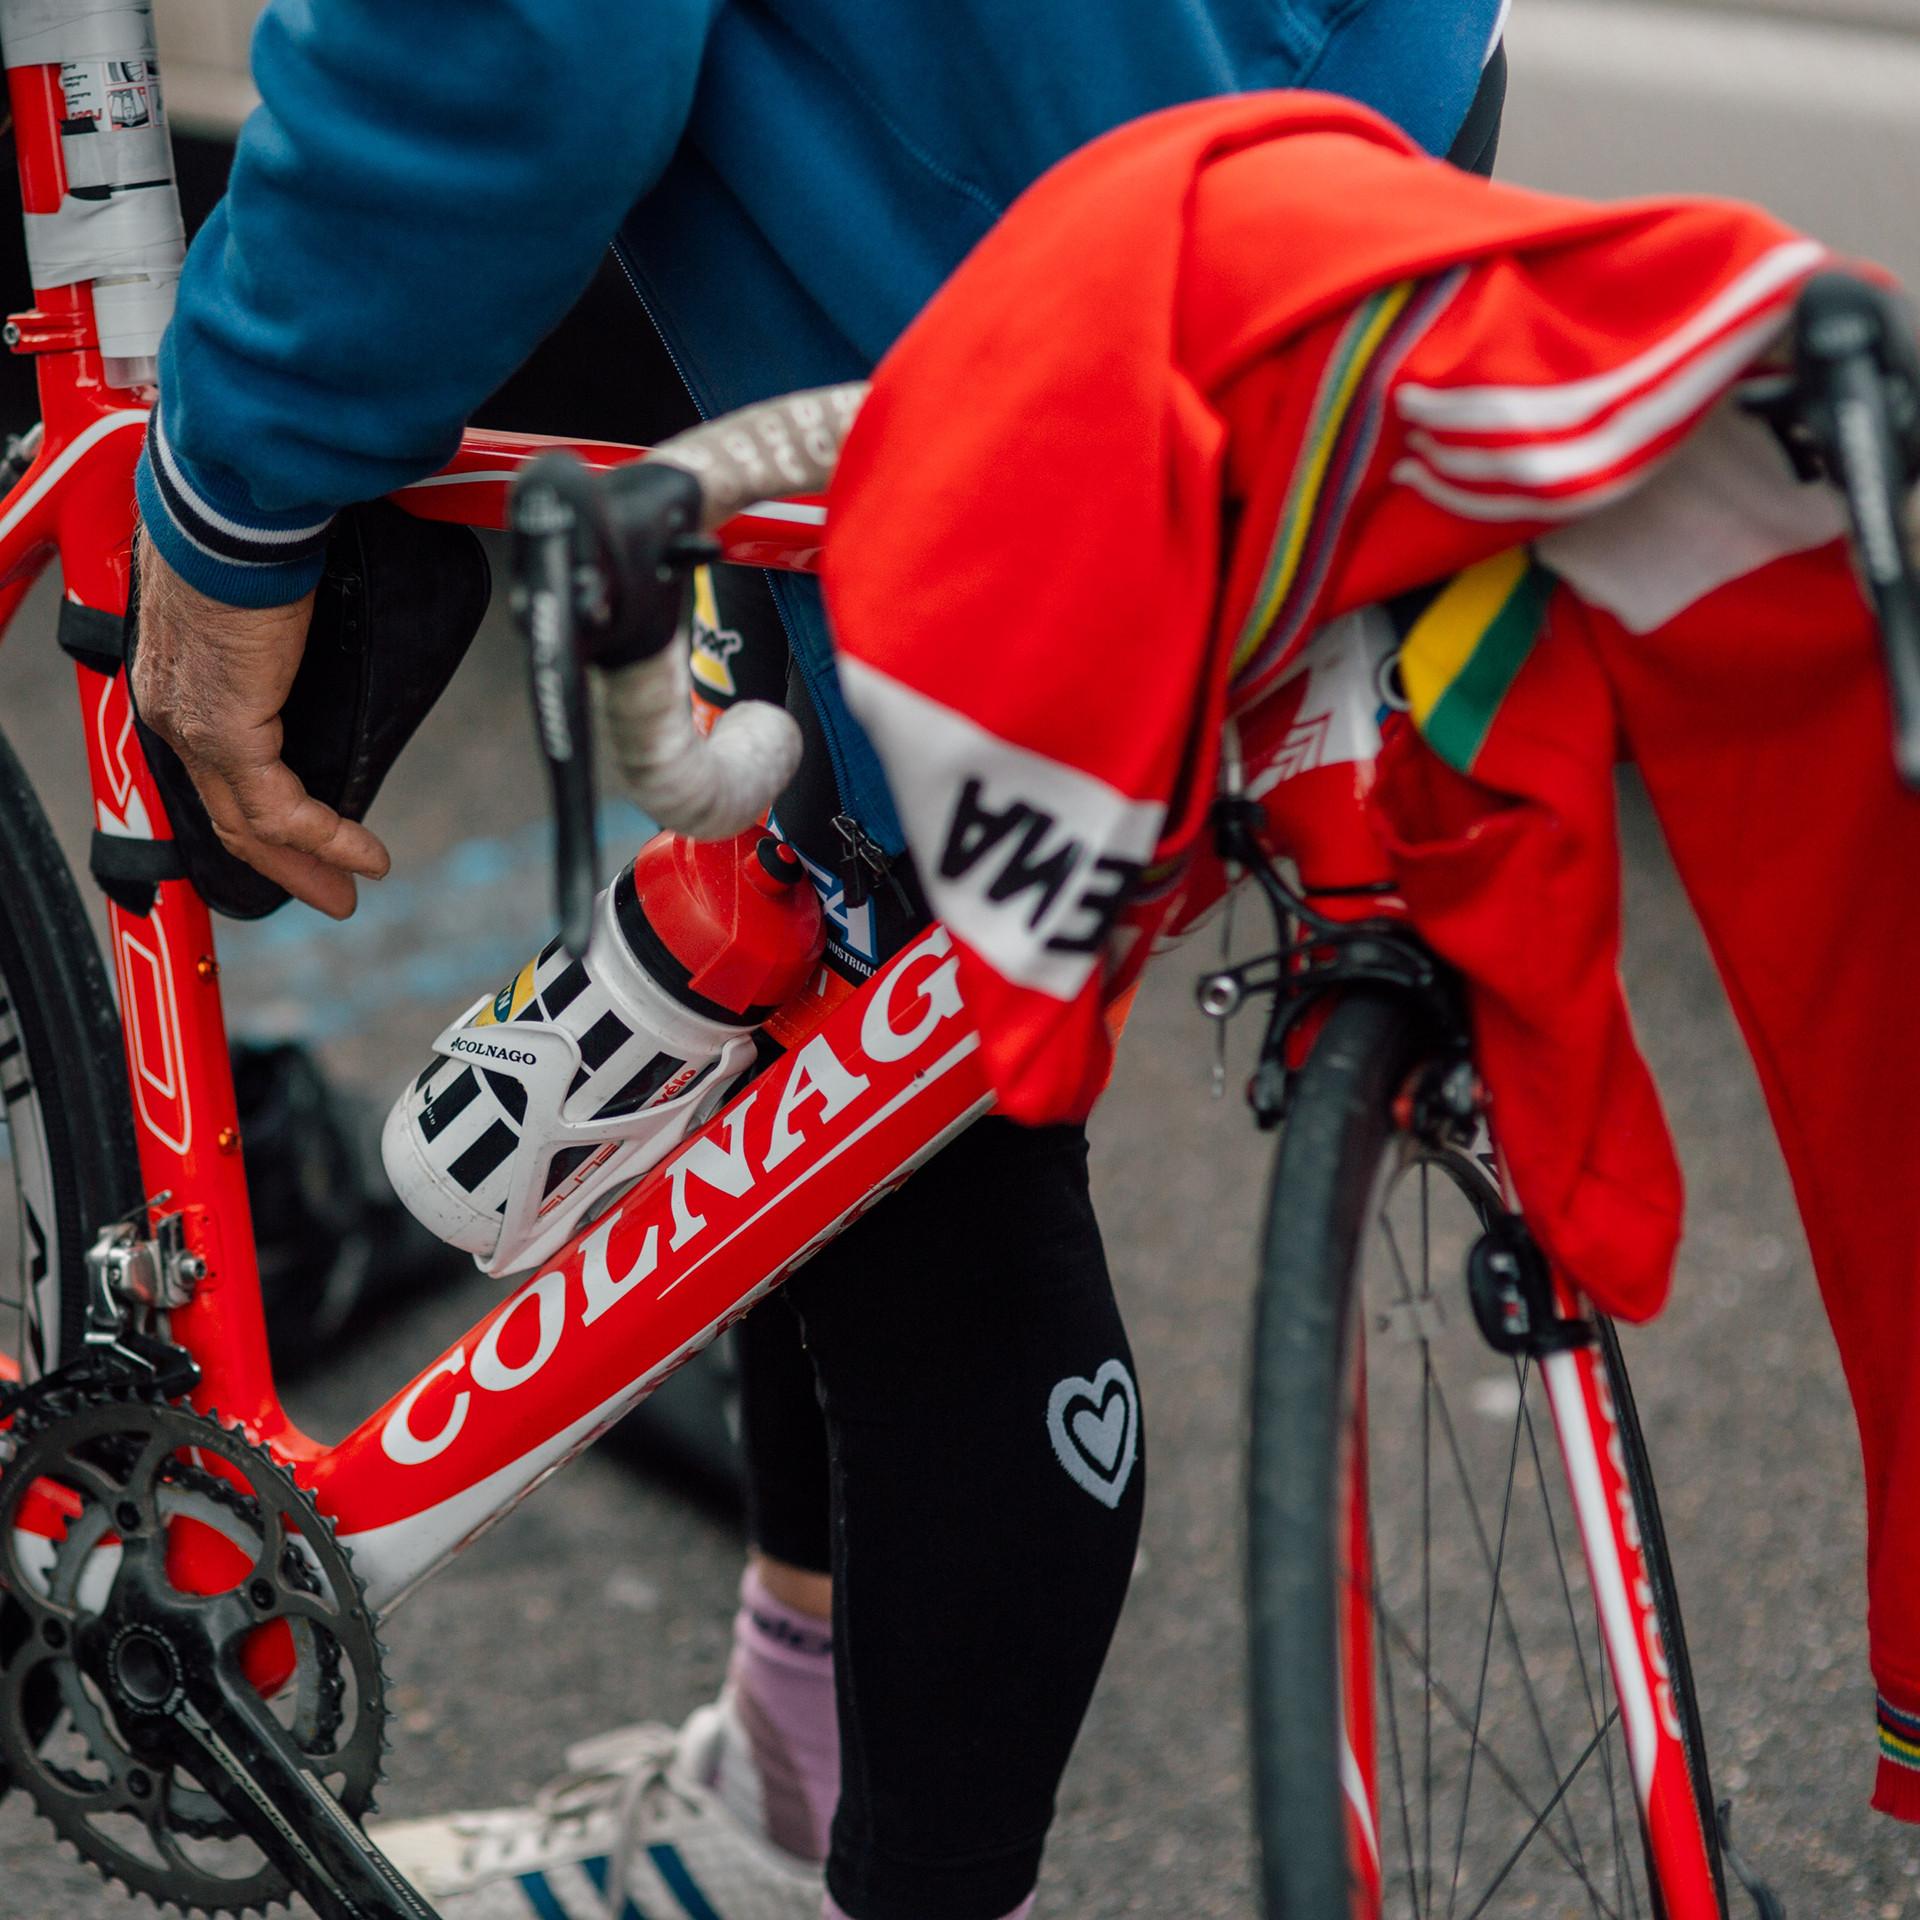 Bike Preparation